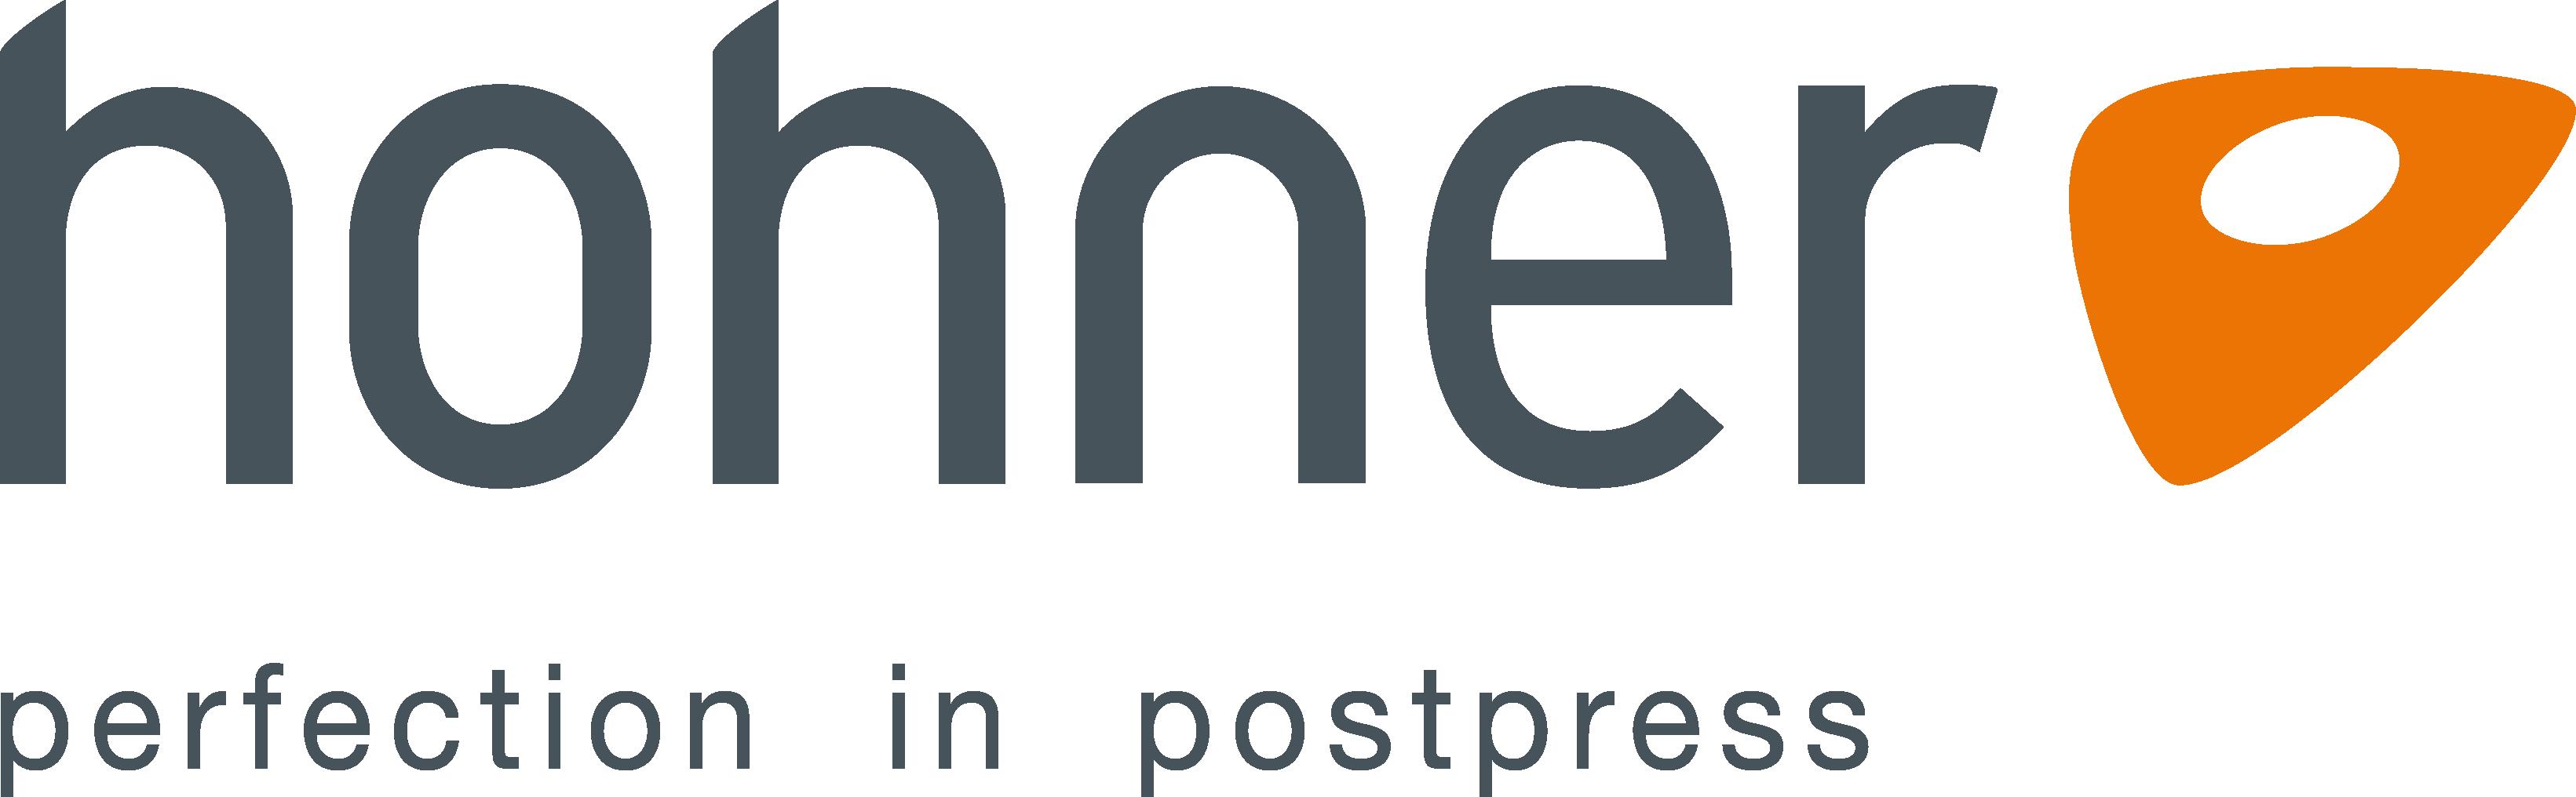 Cyber Postpress